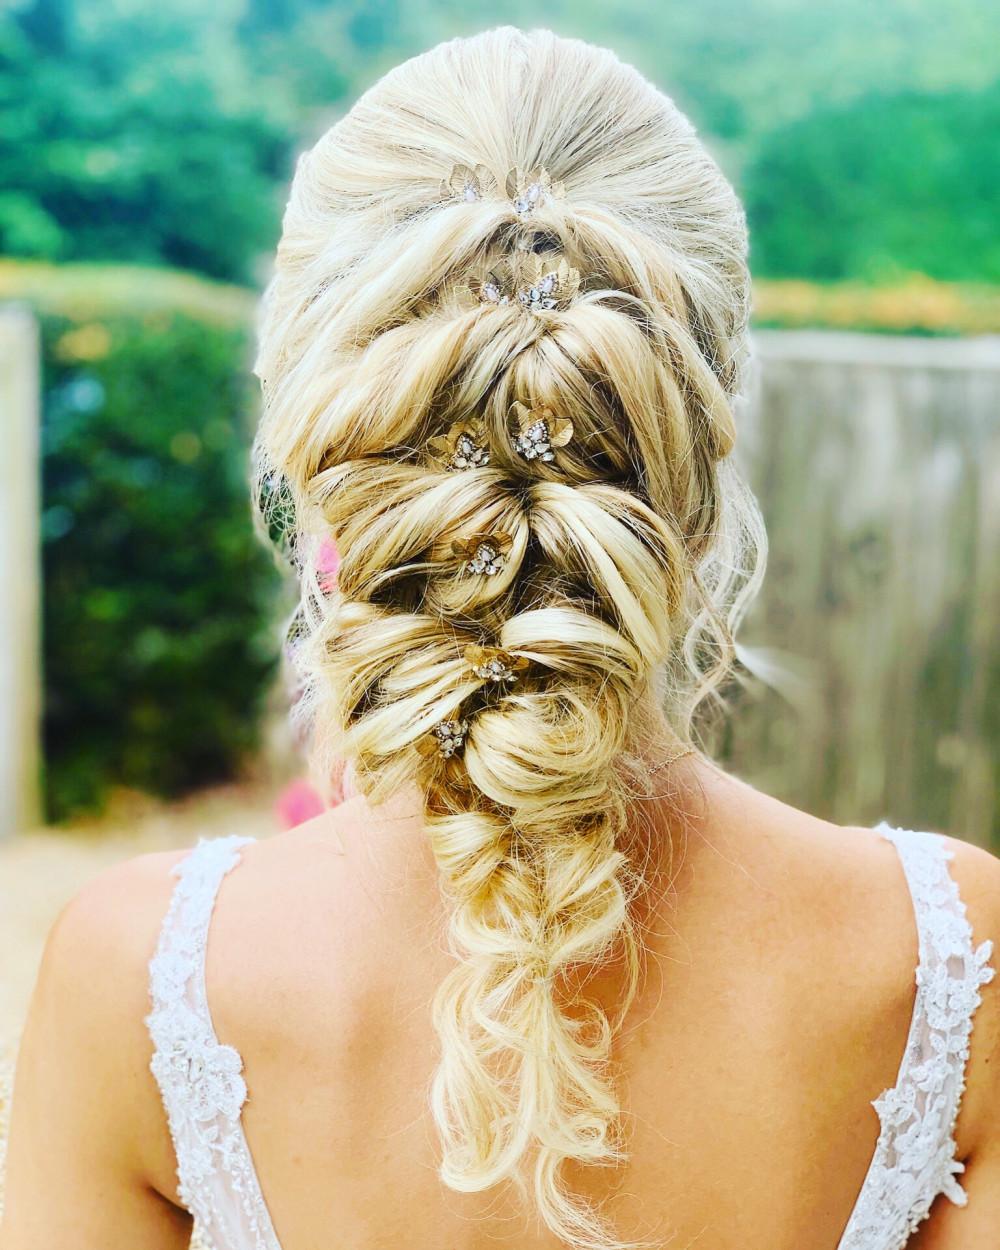 Beautiful bridal hair using extensions and braiding - Make Me Bridal Artist: RLM wedding makeup. #bohemian #mermaidbraid